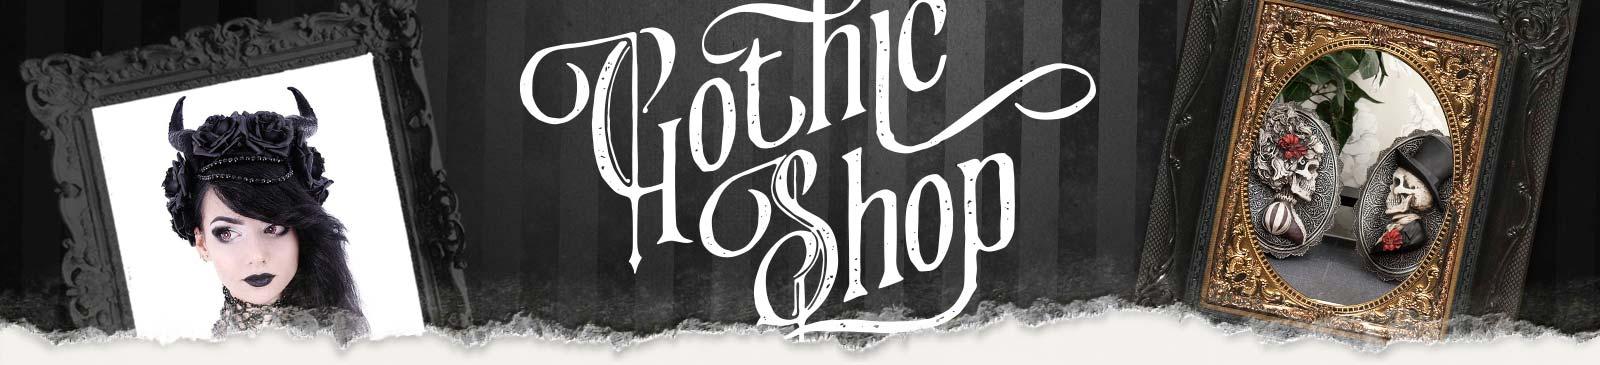 Gothic-Shop